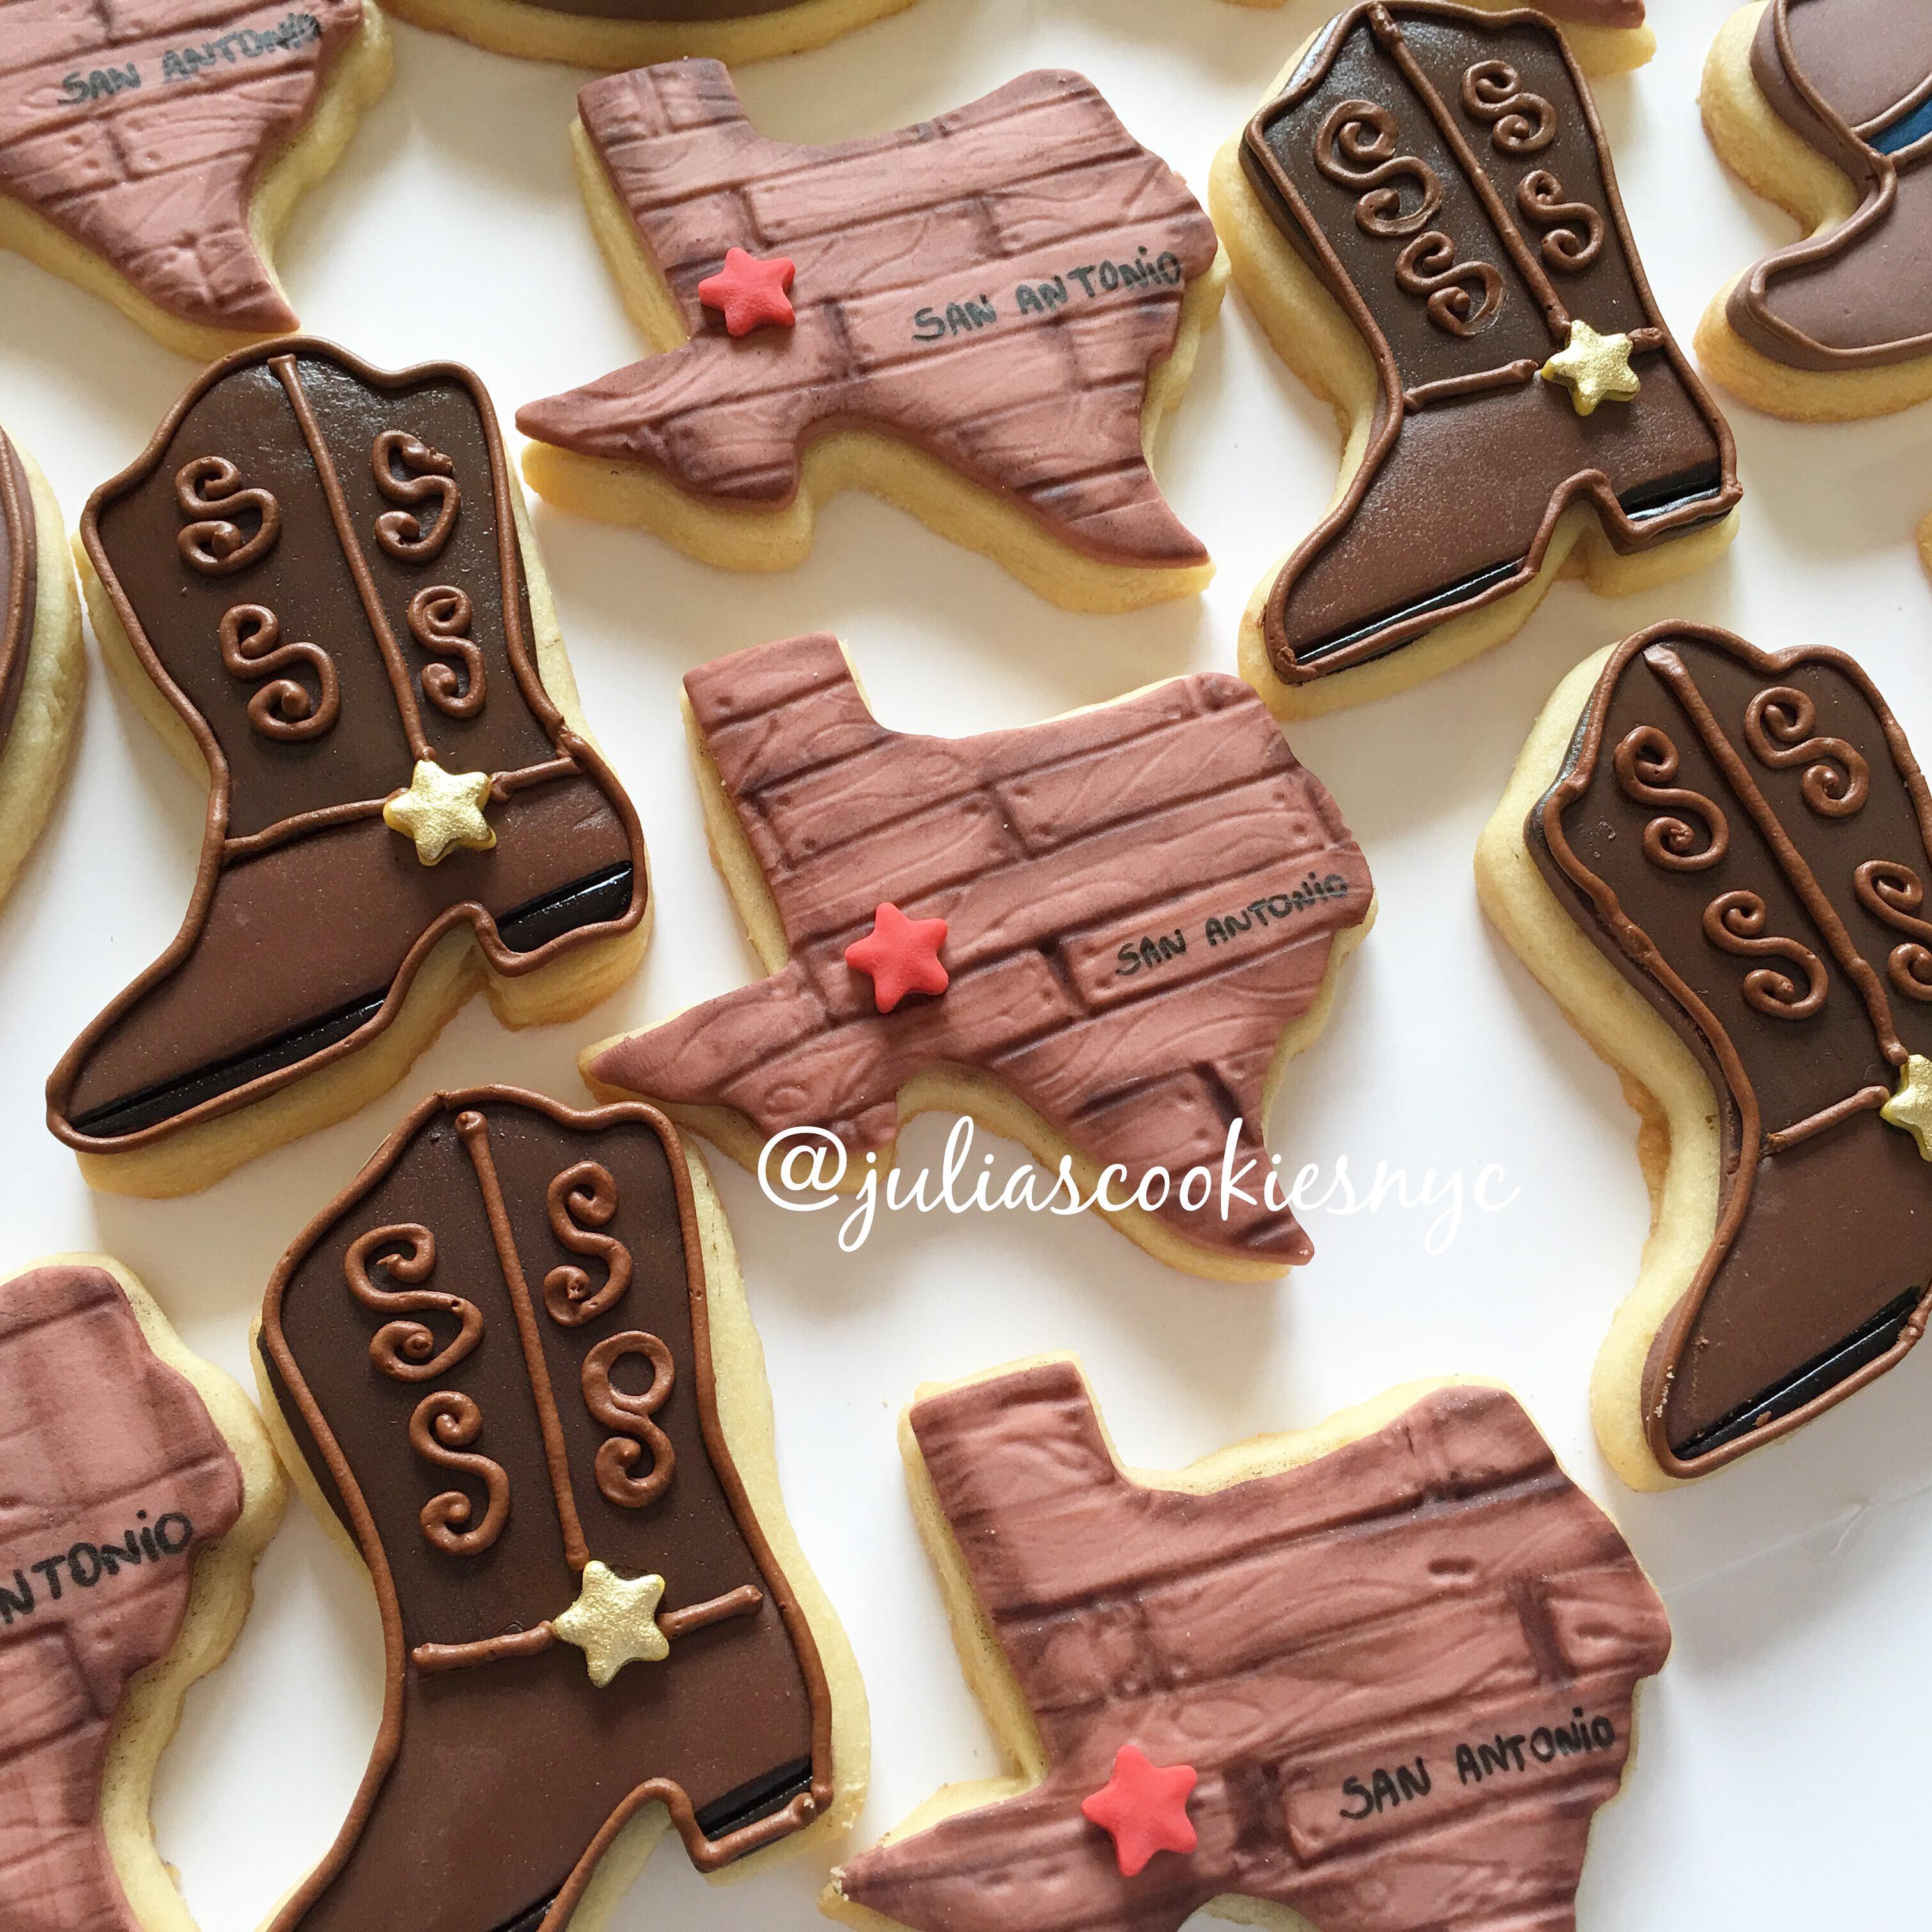 Fondant Cowboy boot cookies